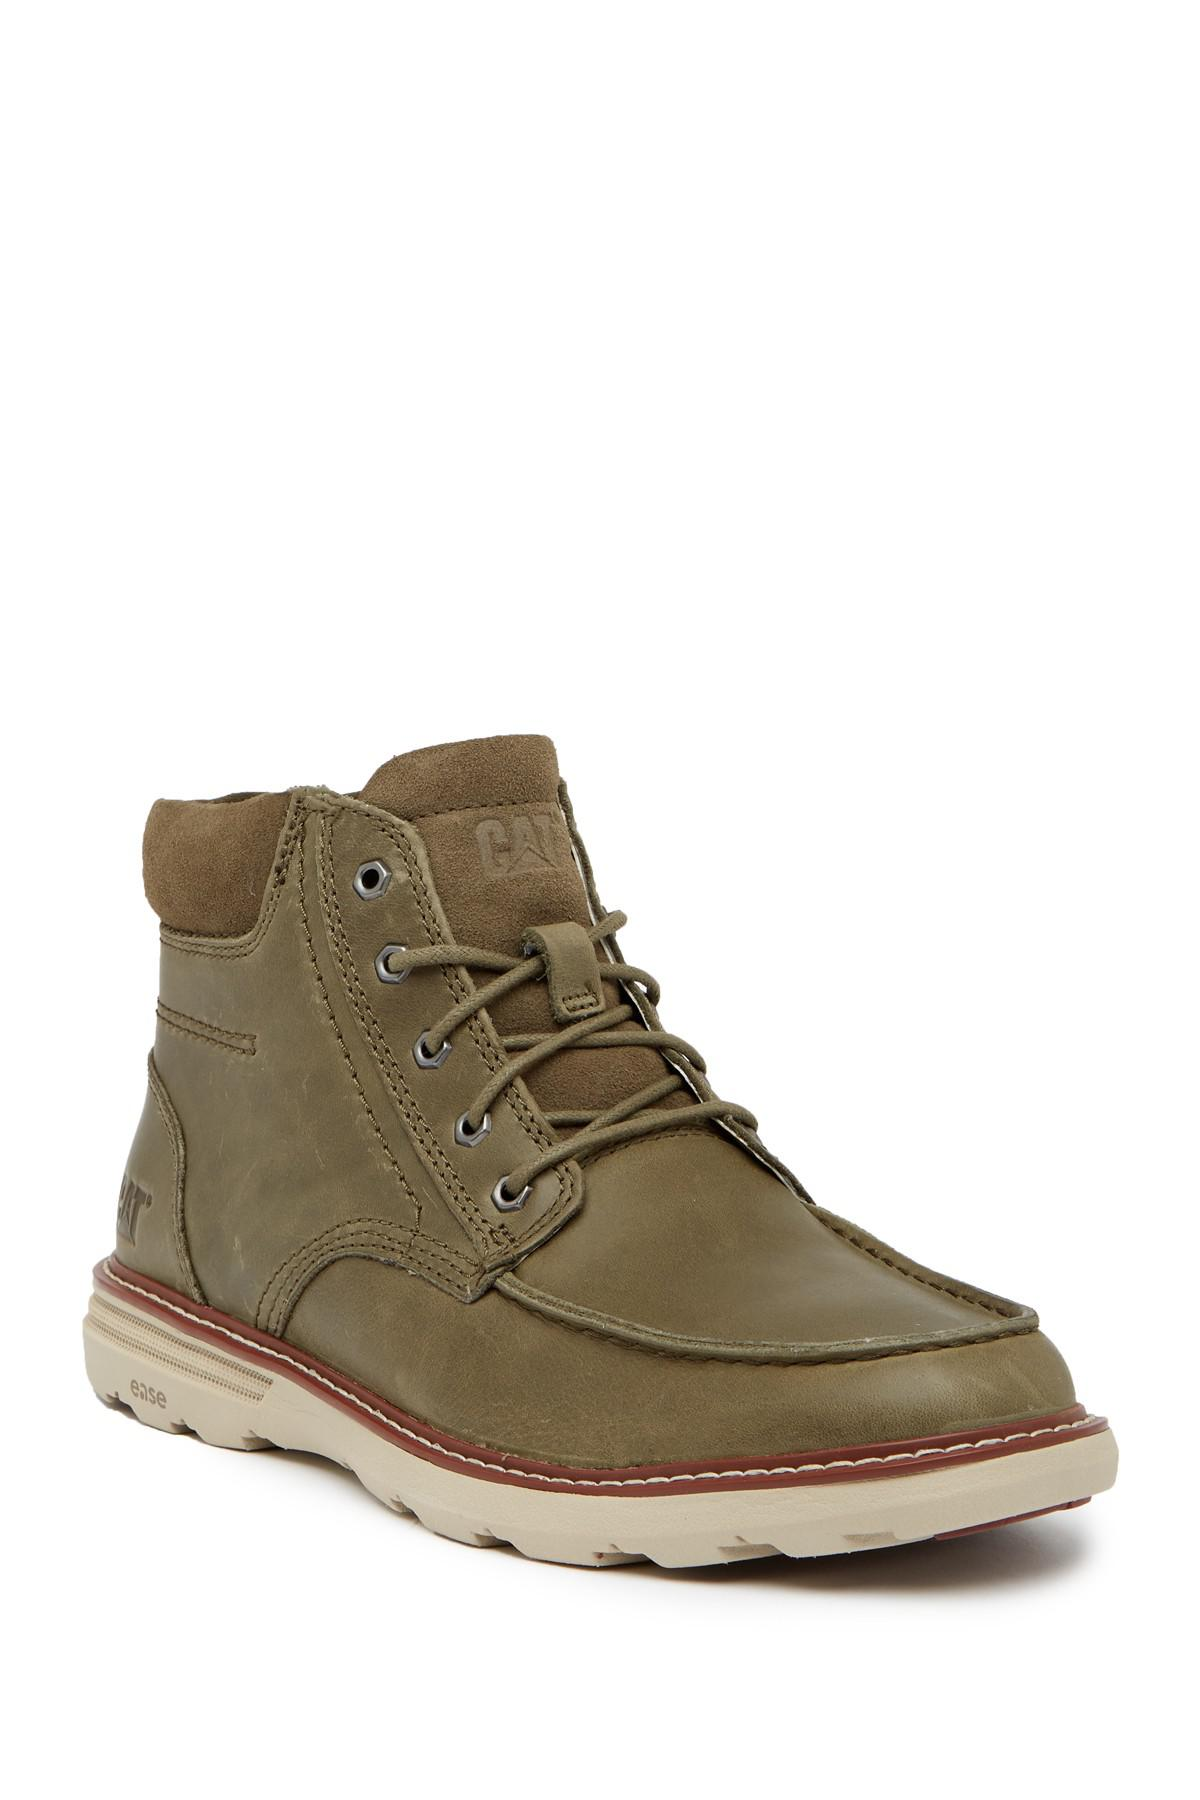 49fdba0bd880f Caterpillar Duke Lace-up Boot for Men - Lyst